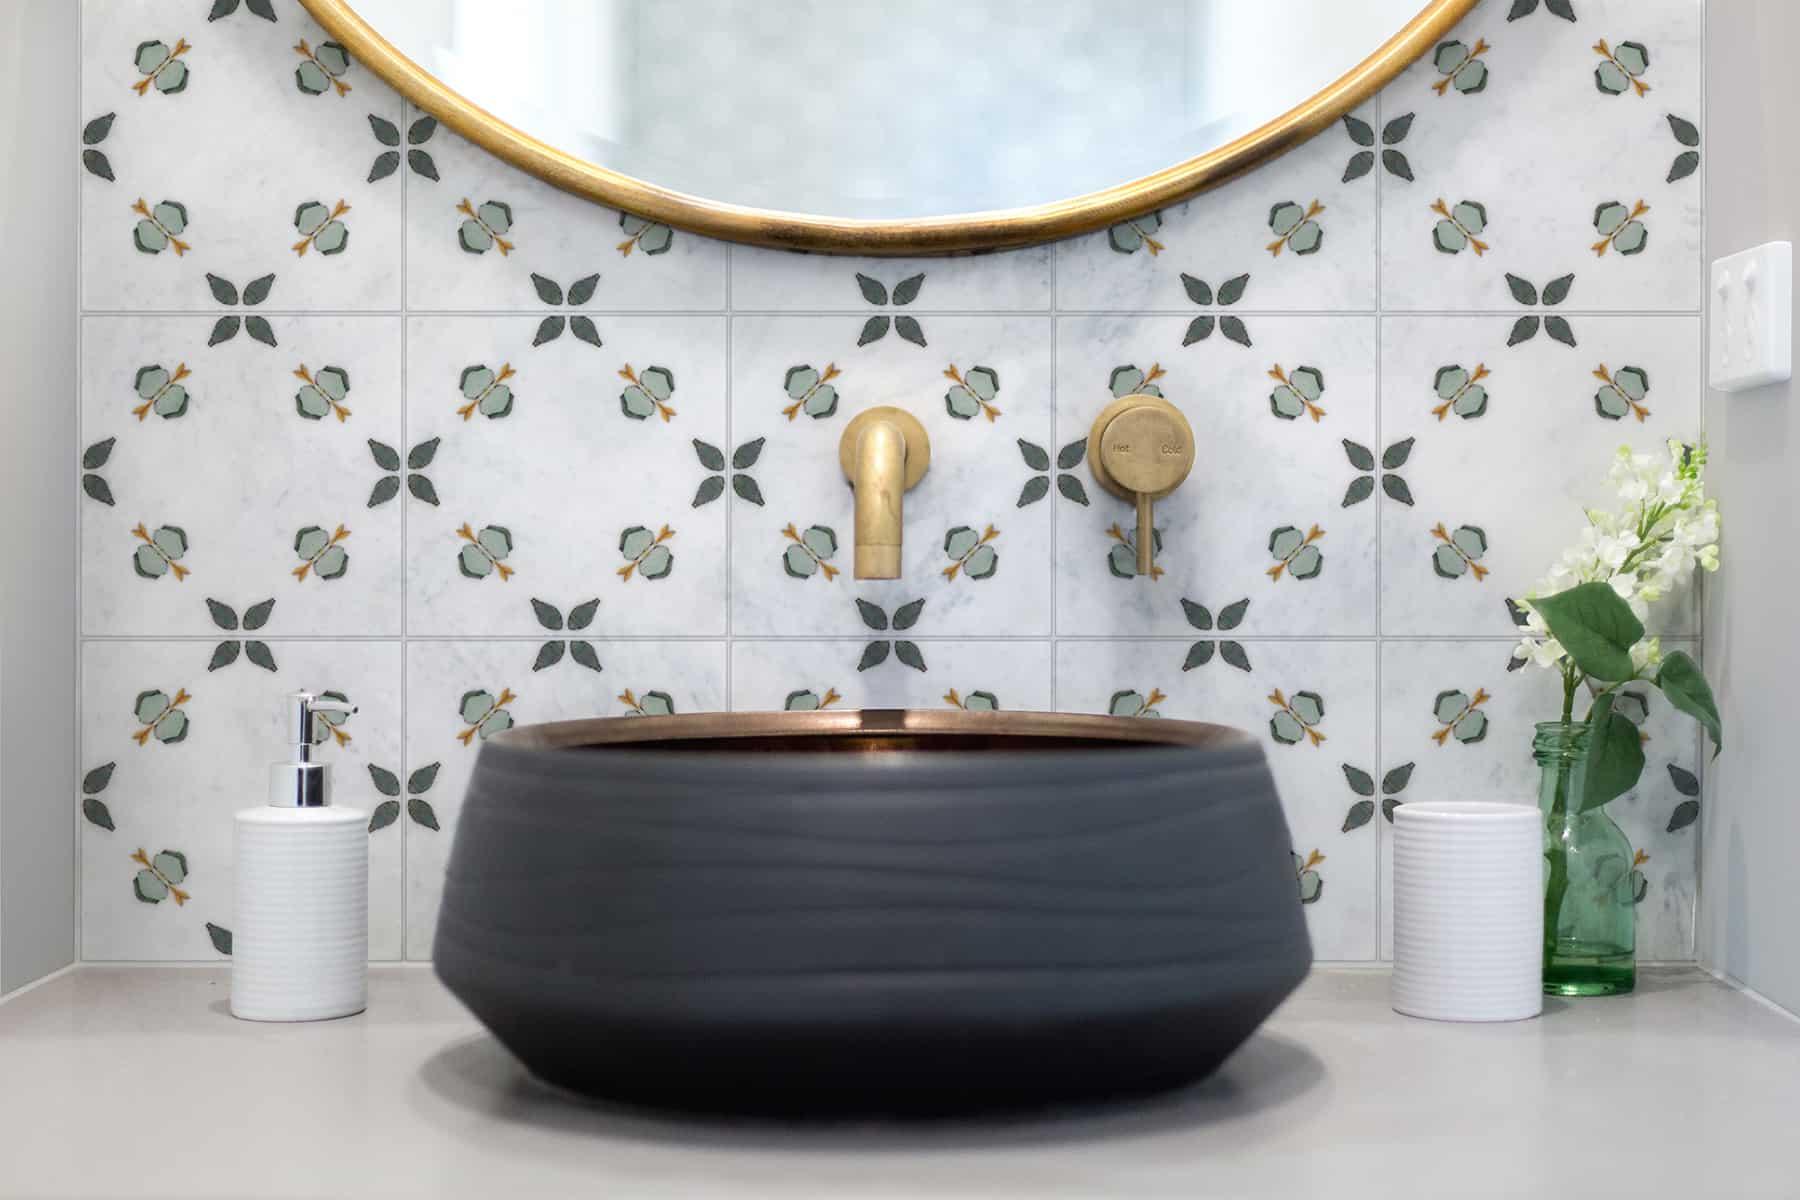 Jax (Juniper) Carrara Bathroom Sink